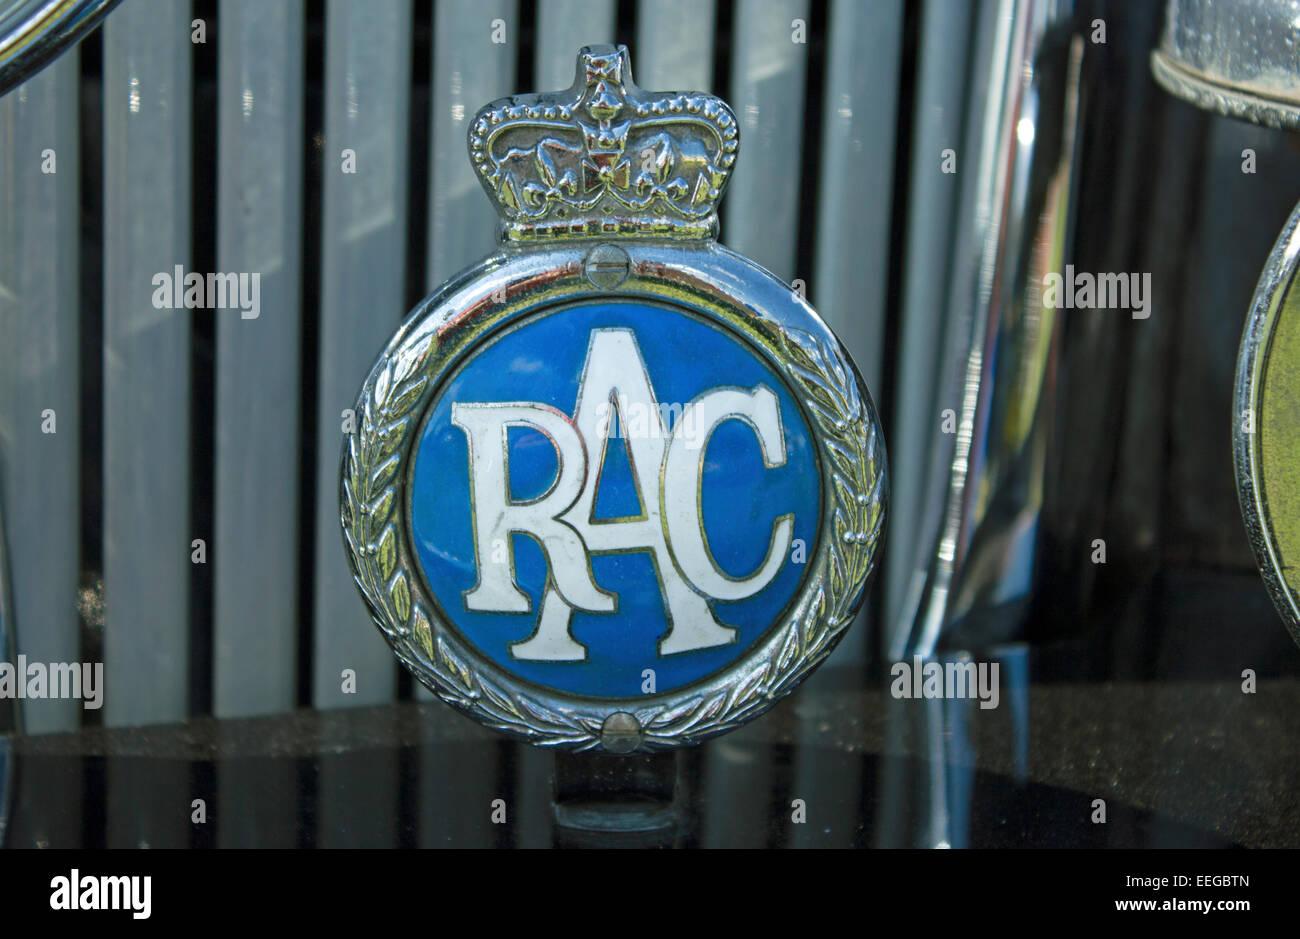 rac badges dating